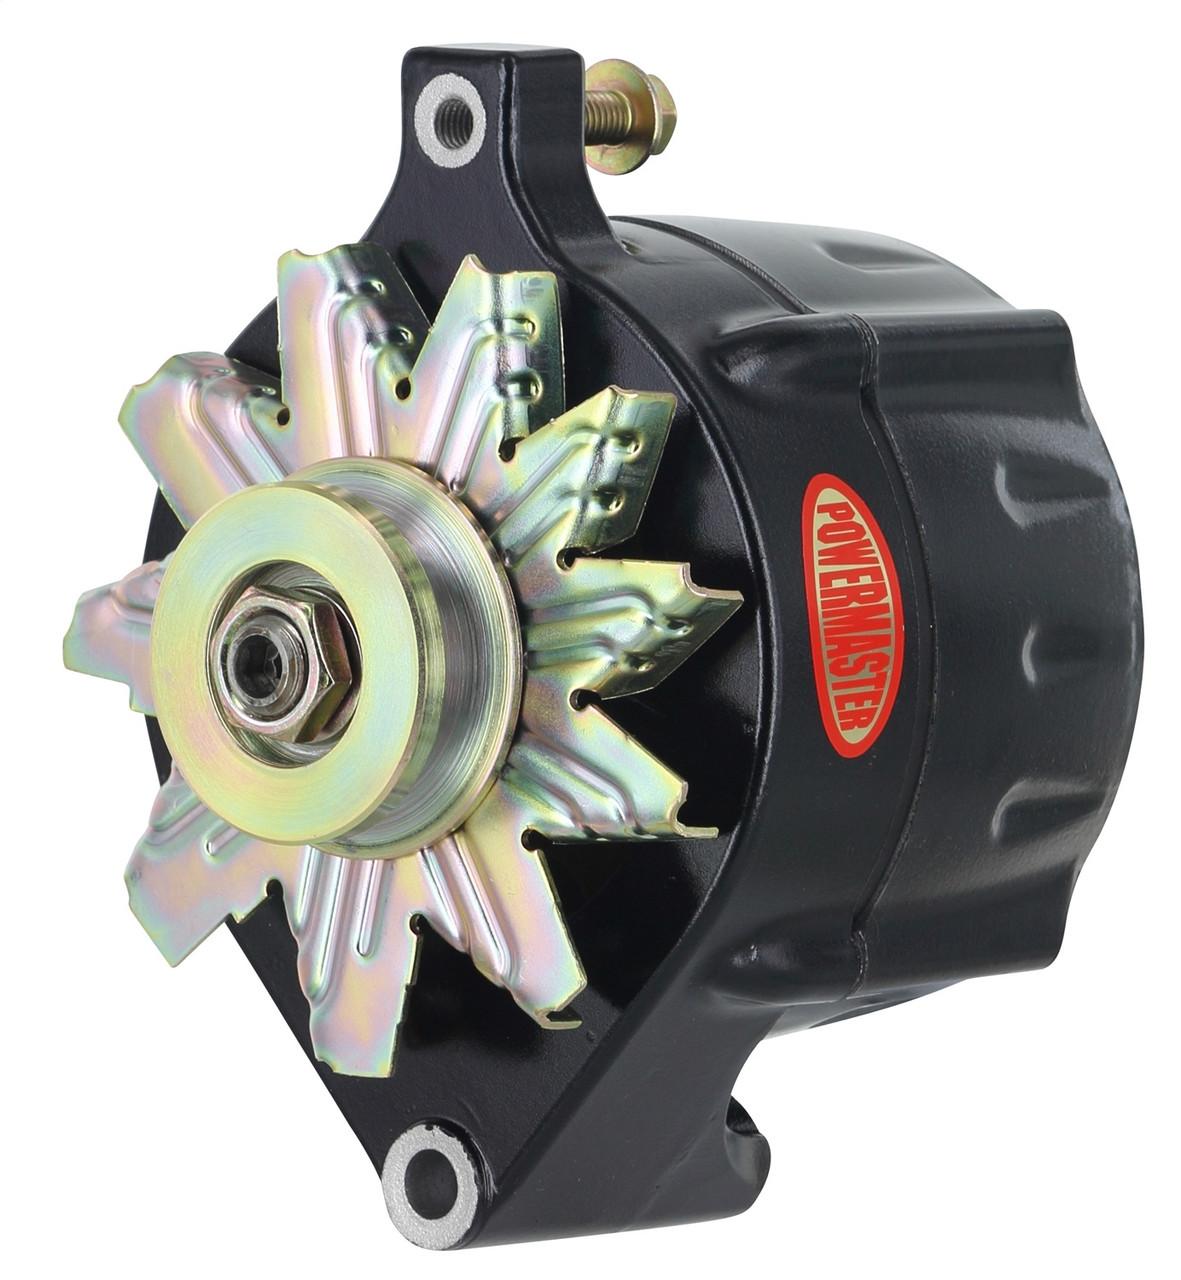 [ZHKZ_3066]  Powermaster Ford 1-Wire 100 Amp Upgrade Alternator, Black - SO-CAL Speed  Shop AZ | Ford Powermaster Alternators Wiring |  | SO-CAL Speed Shop AZ